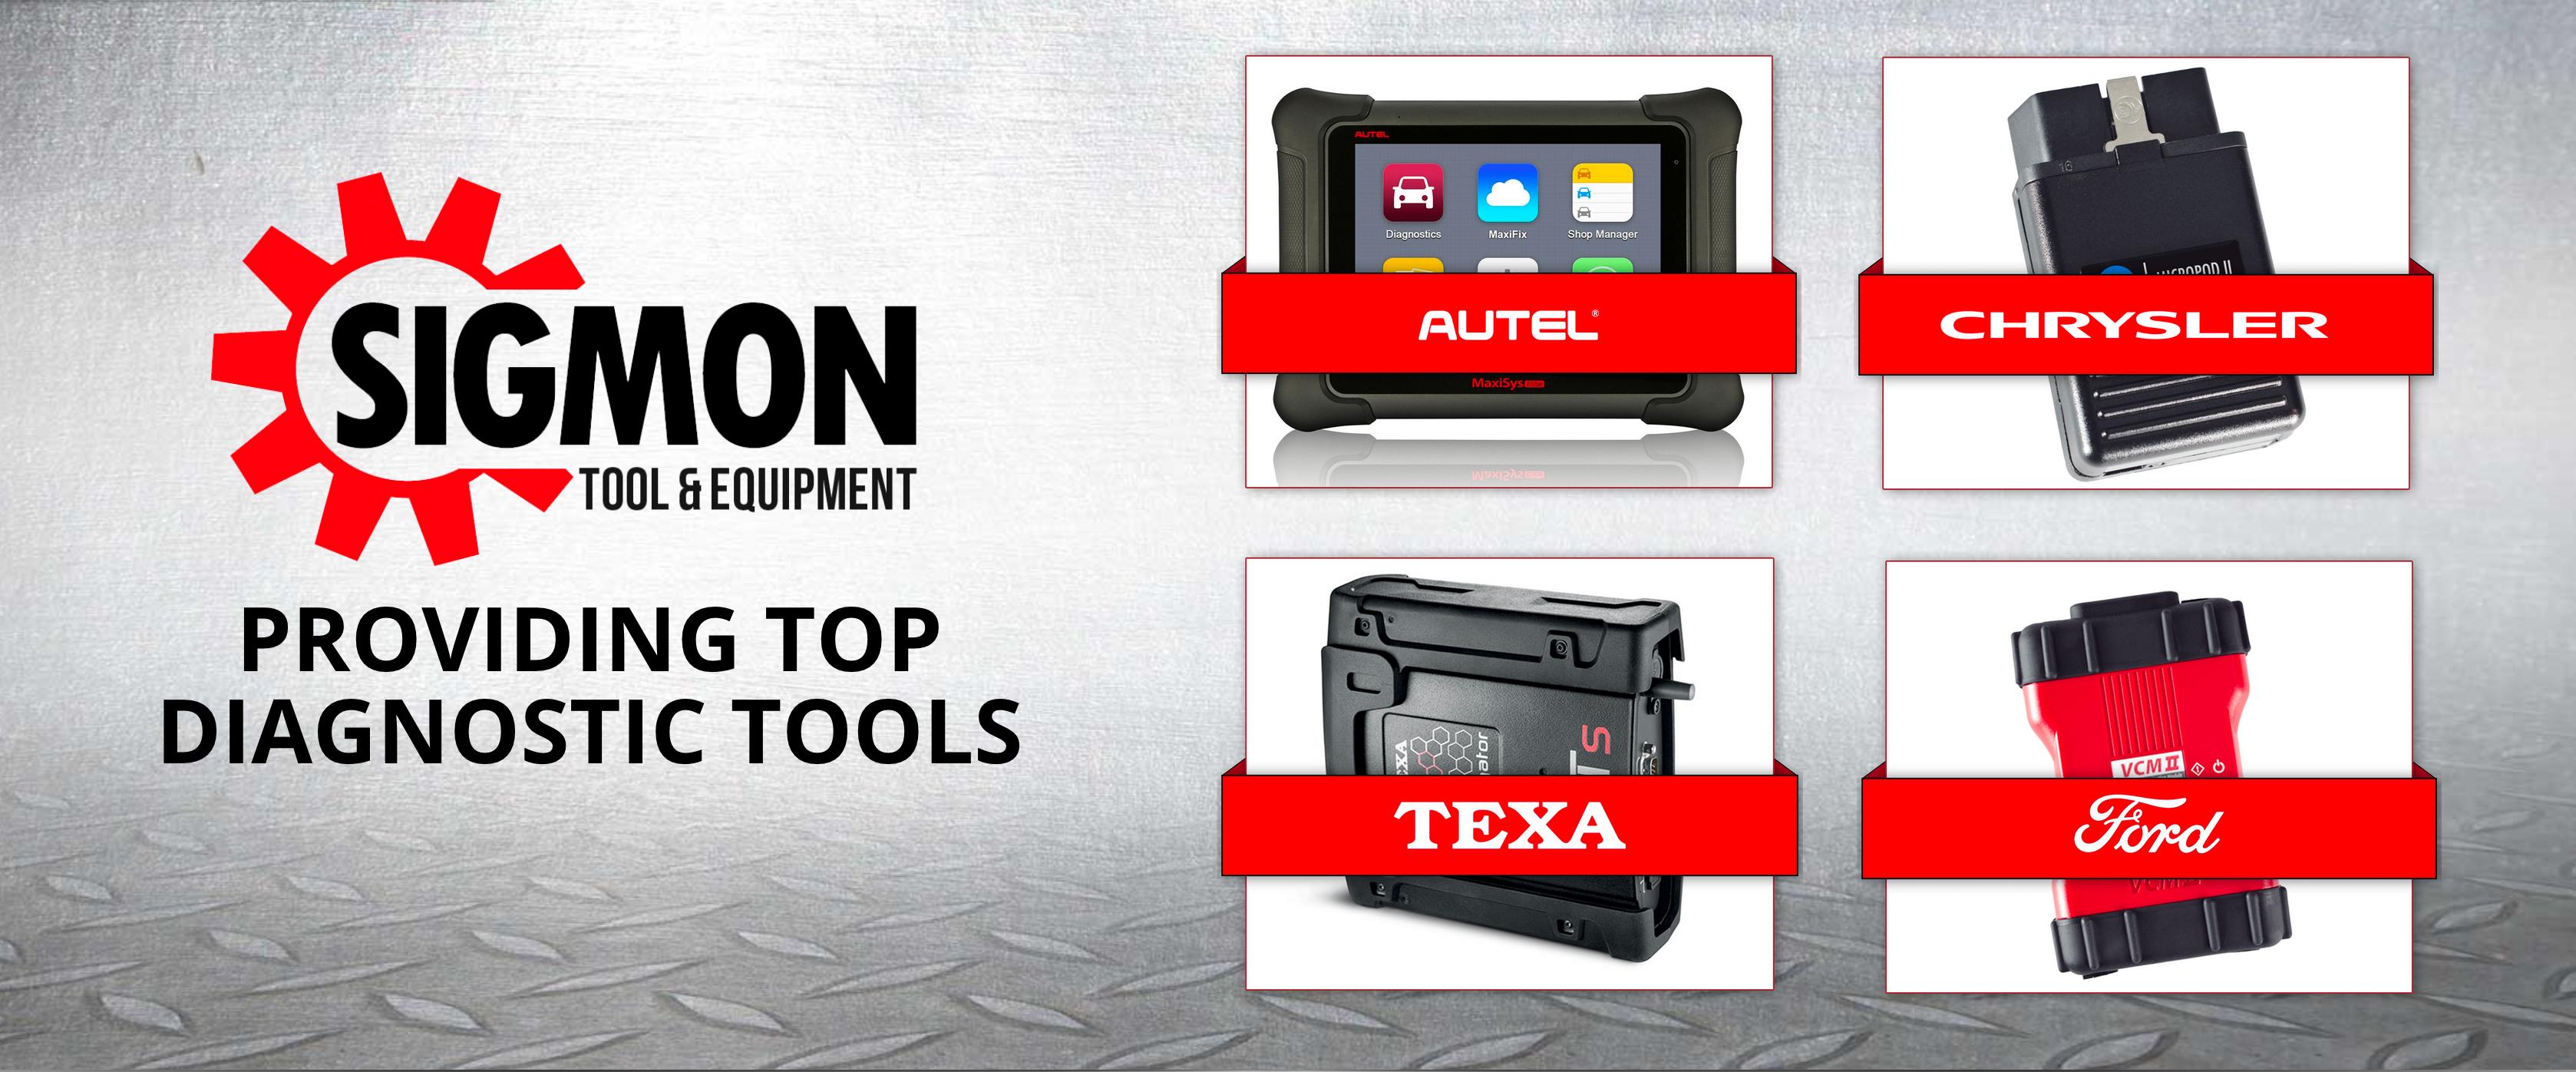 Sigmon Tool & Equipment - Kenner, LA